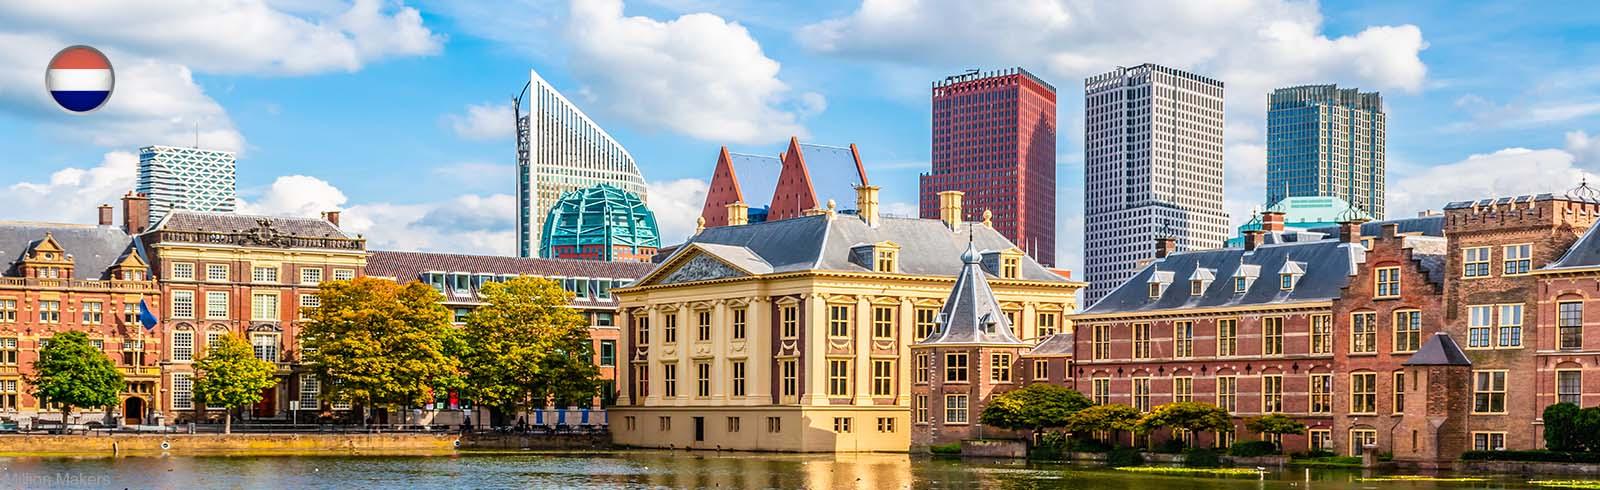 education netherlands university netherlands study netherlands student consultants netherlands university consultancy netherlands study abroad netherlands #1 Best Visa Consultant for Study in Netherlands